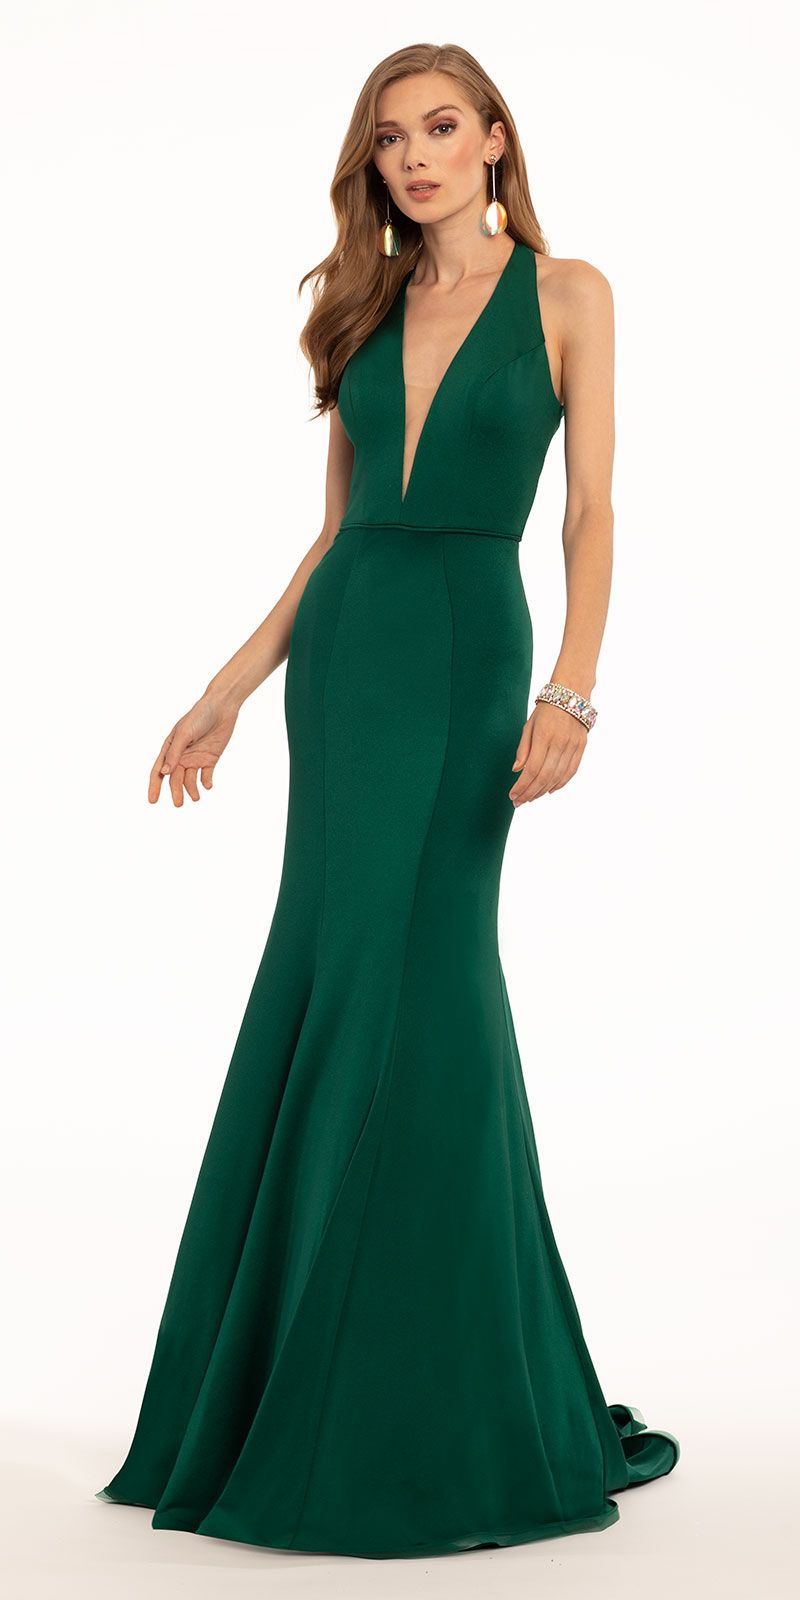 Halter Plunge Keyhole Back Mermaid Dress Dresses Formal Wedding Guest Dress Mermaid Dress [ 1600 x 800 Pixel ]